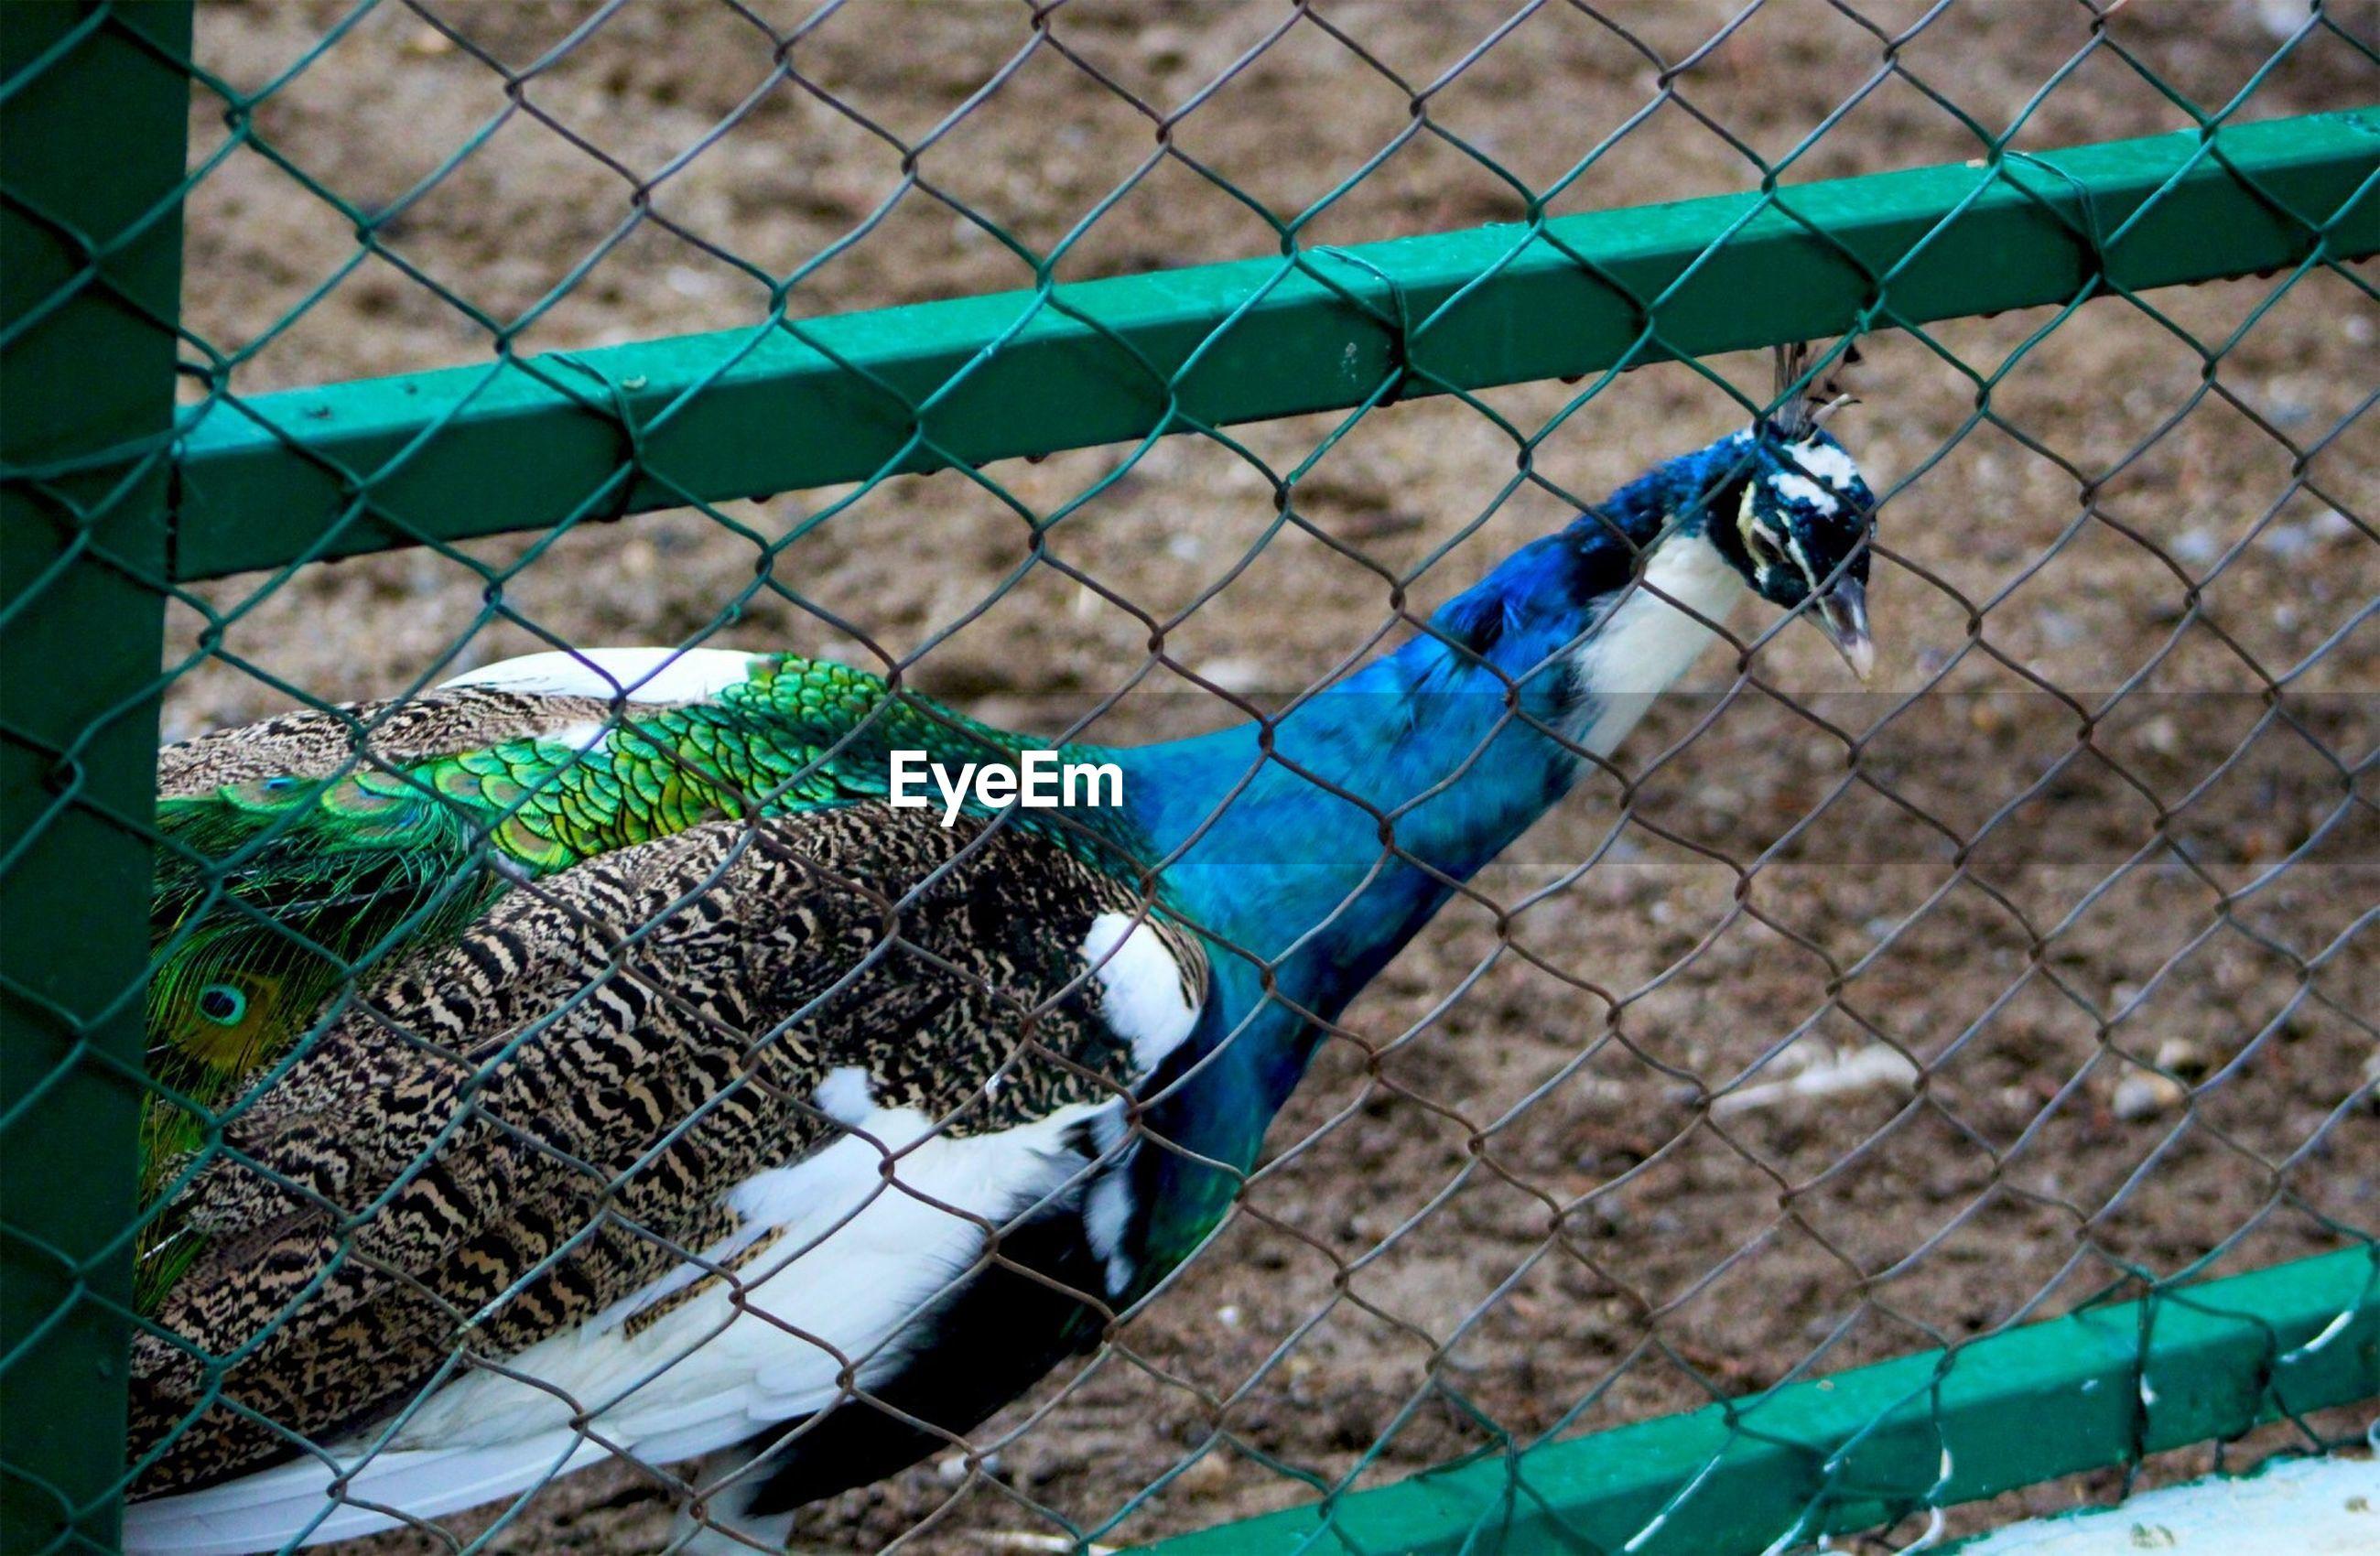 CLOSE-UP OF A BIRD FENCE